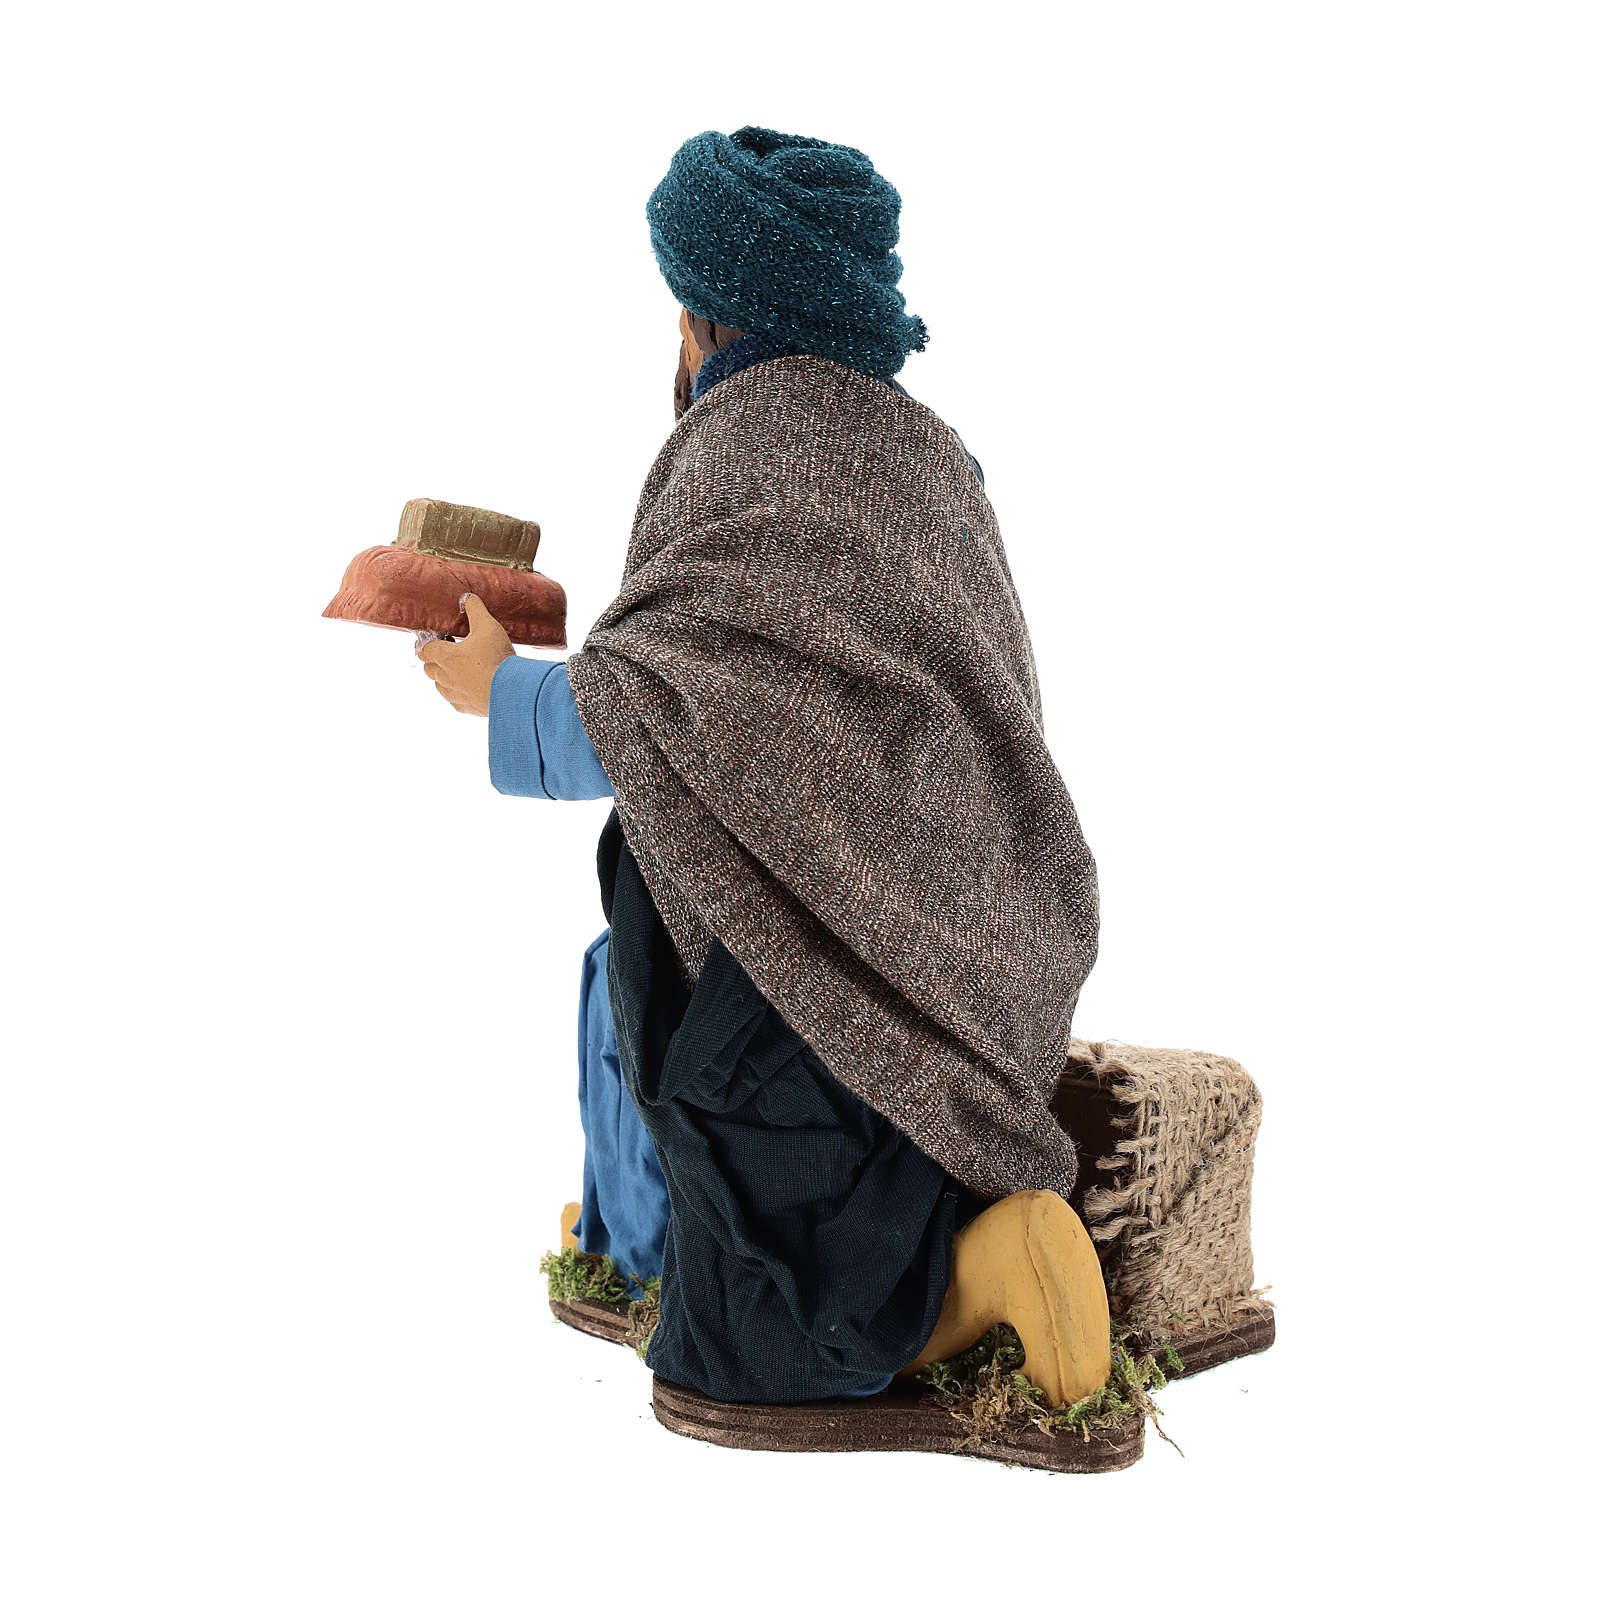 Animated Neapolitan Nativity figurine kneeling Wise King 30cm 4